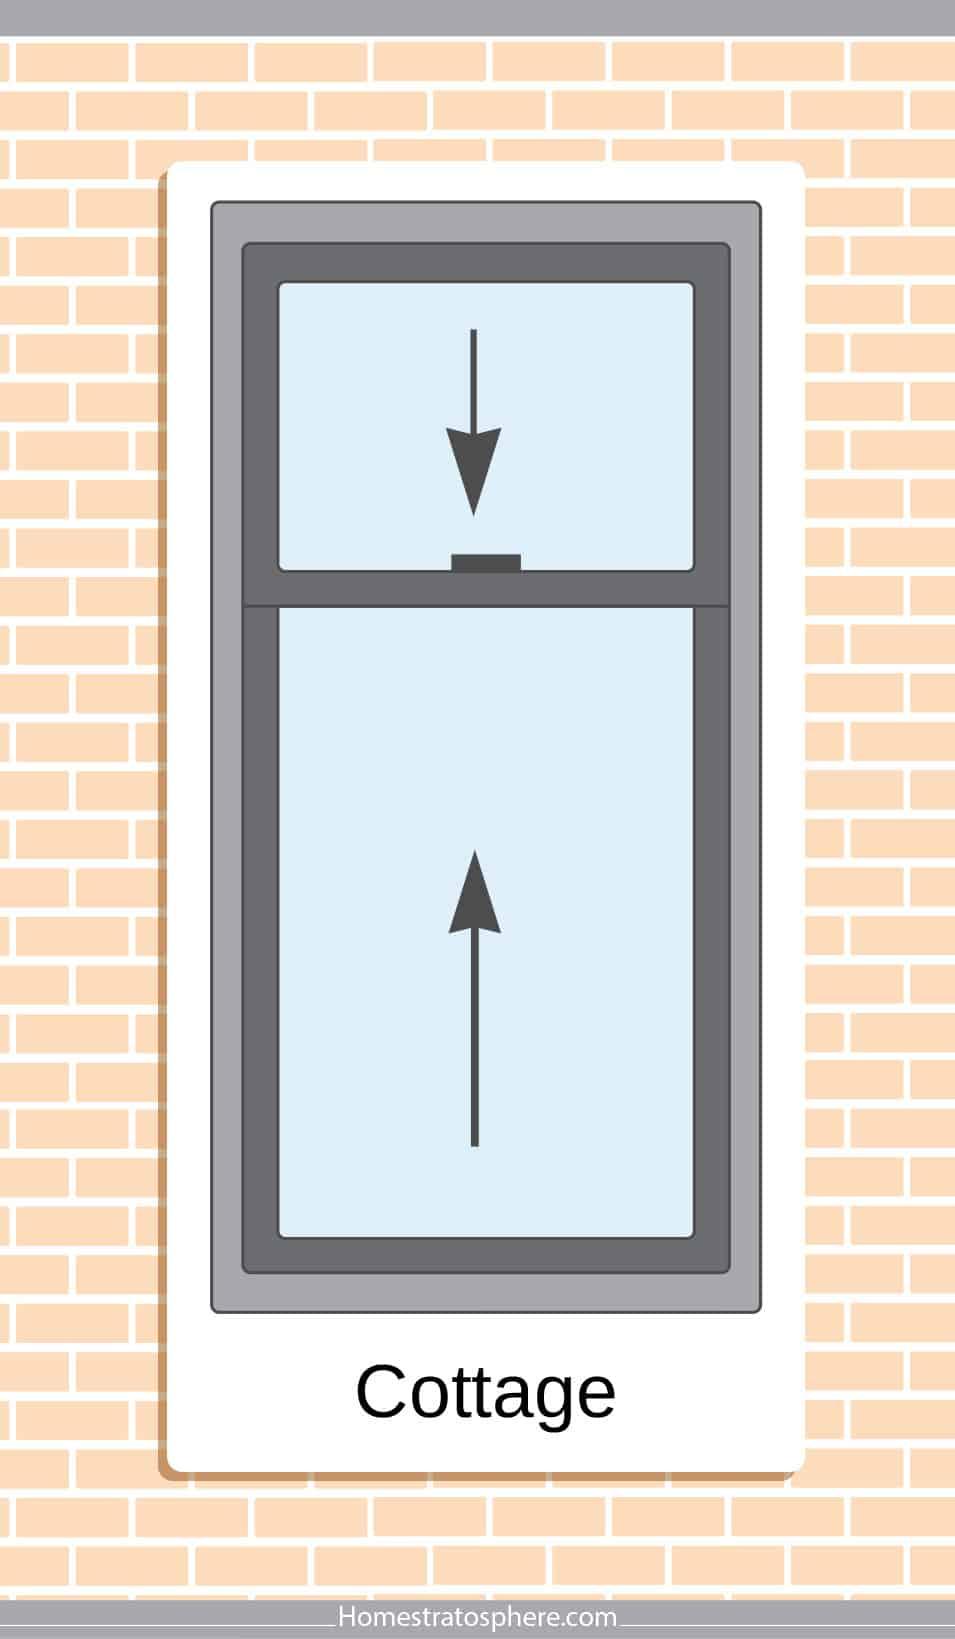 Cottage window style